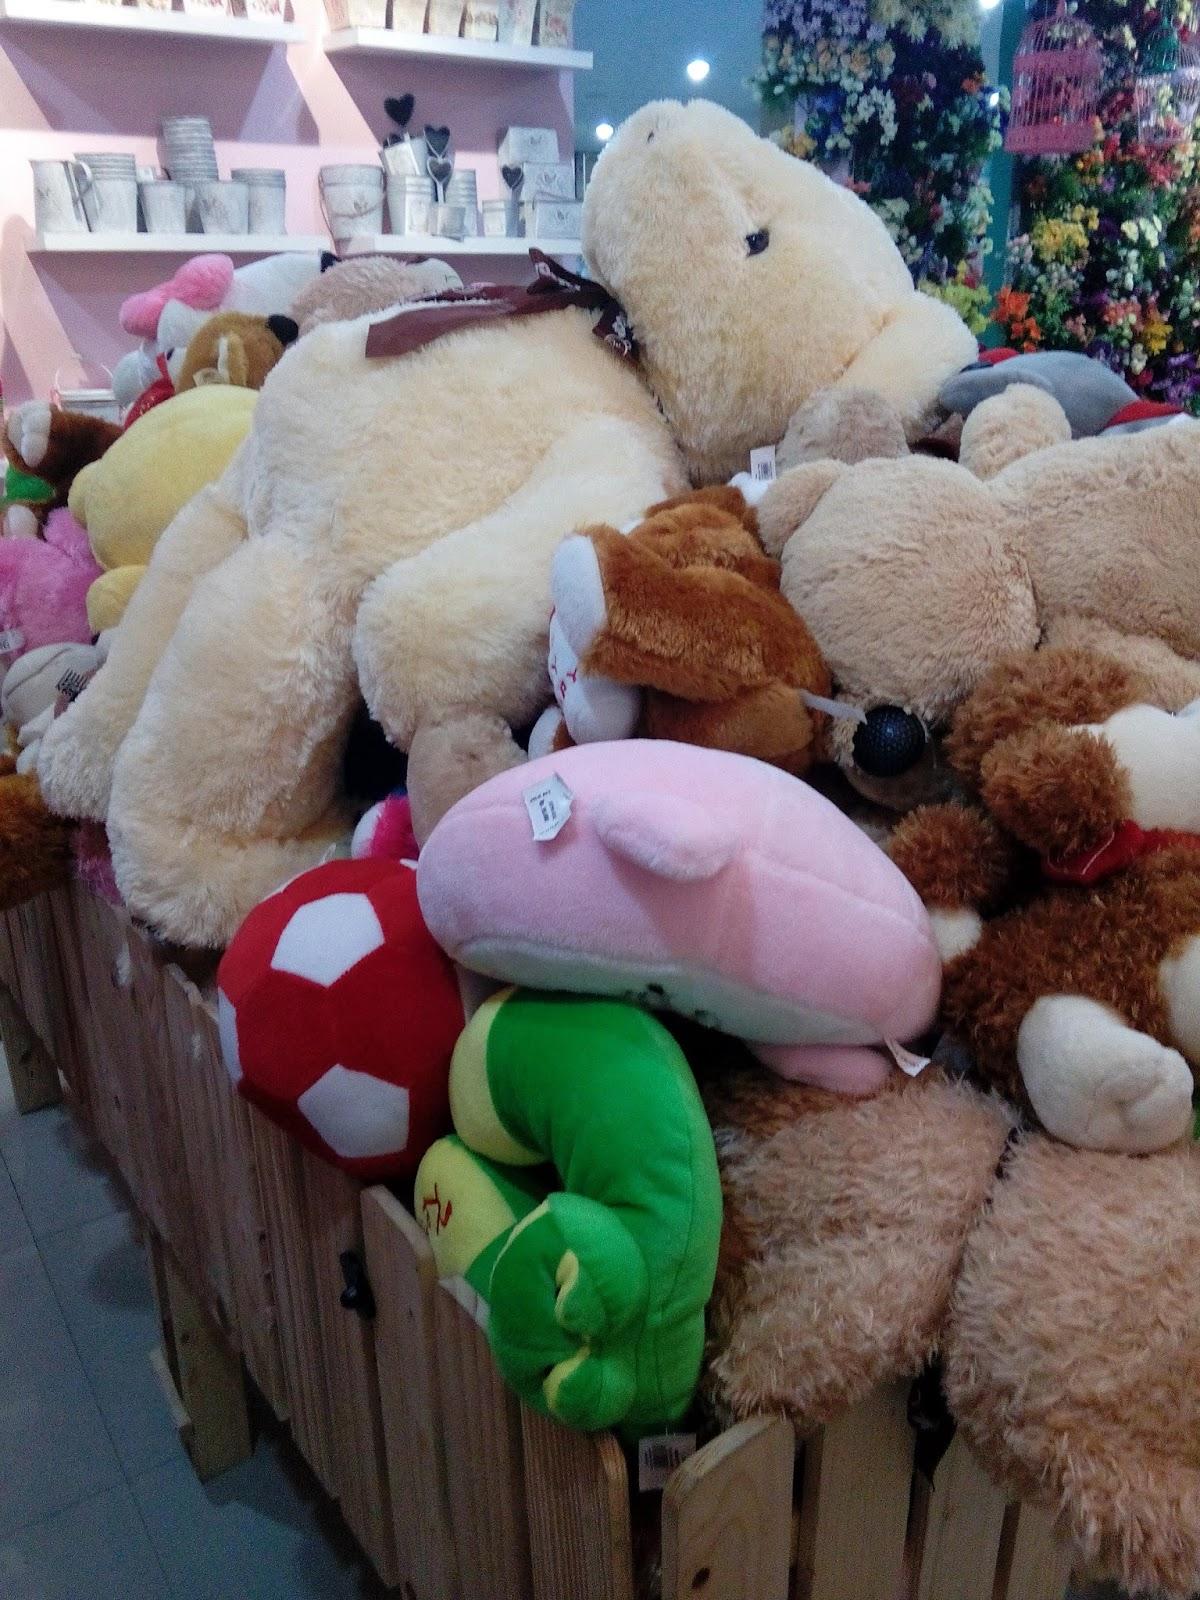 boneka teddy bear raksasa Jolie Jogja Wirobrajan